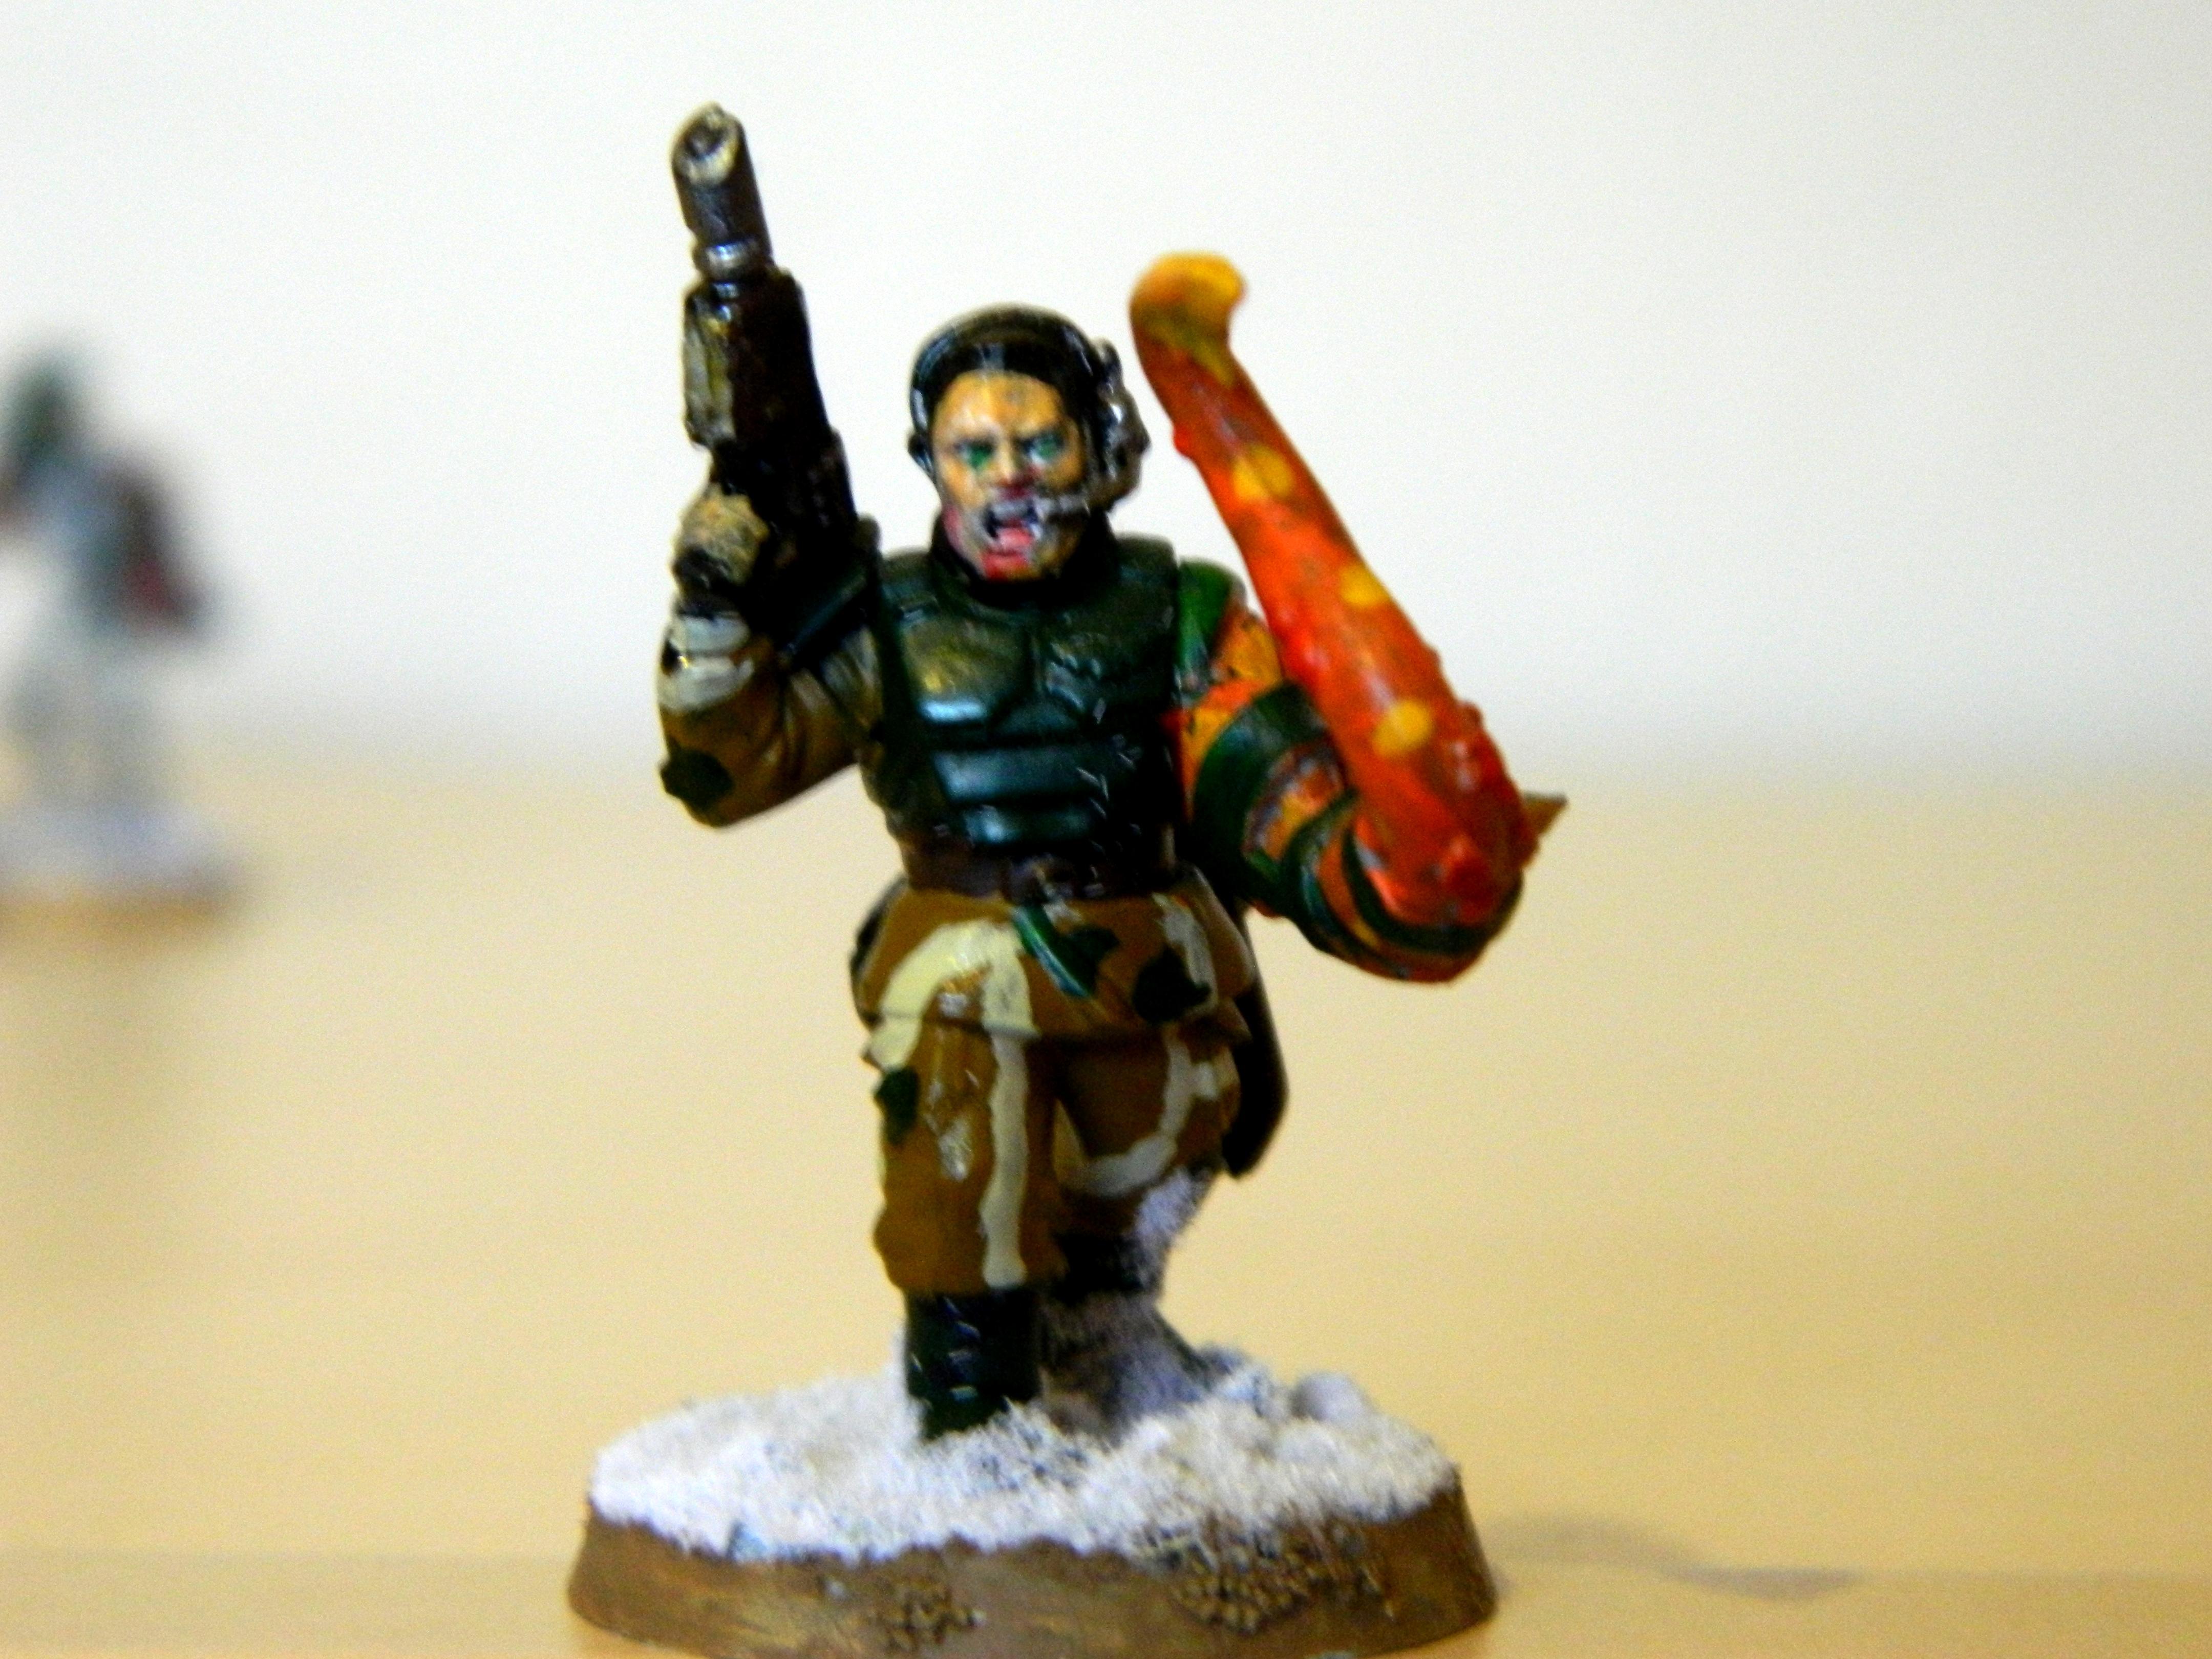 Cannon Fodder, Chaos, Conversion, Cultist, Mutant, Snow, Traitors